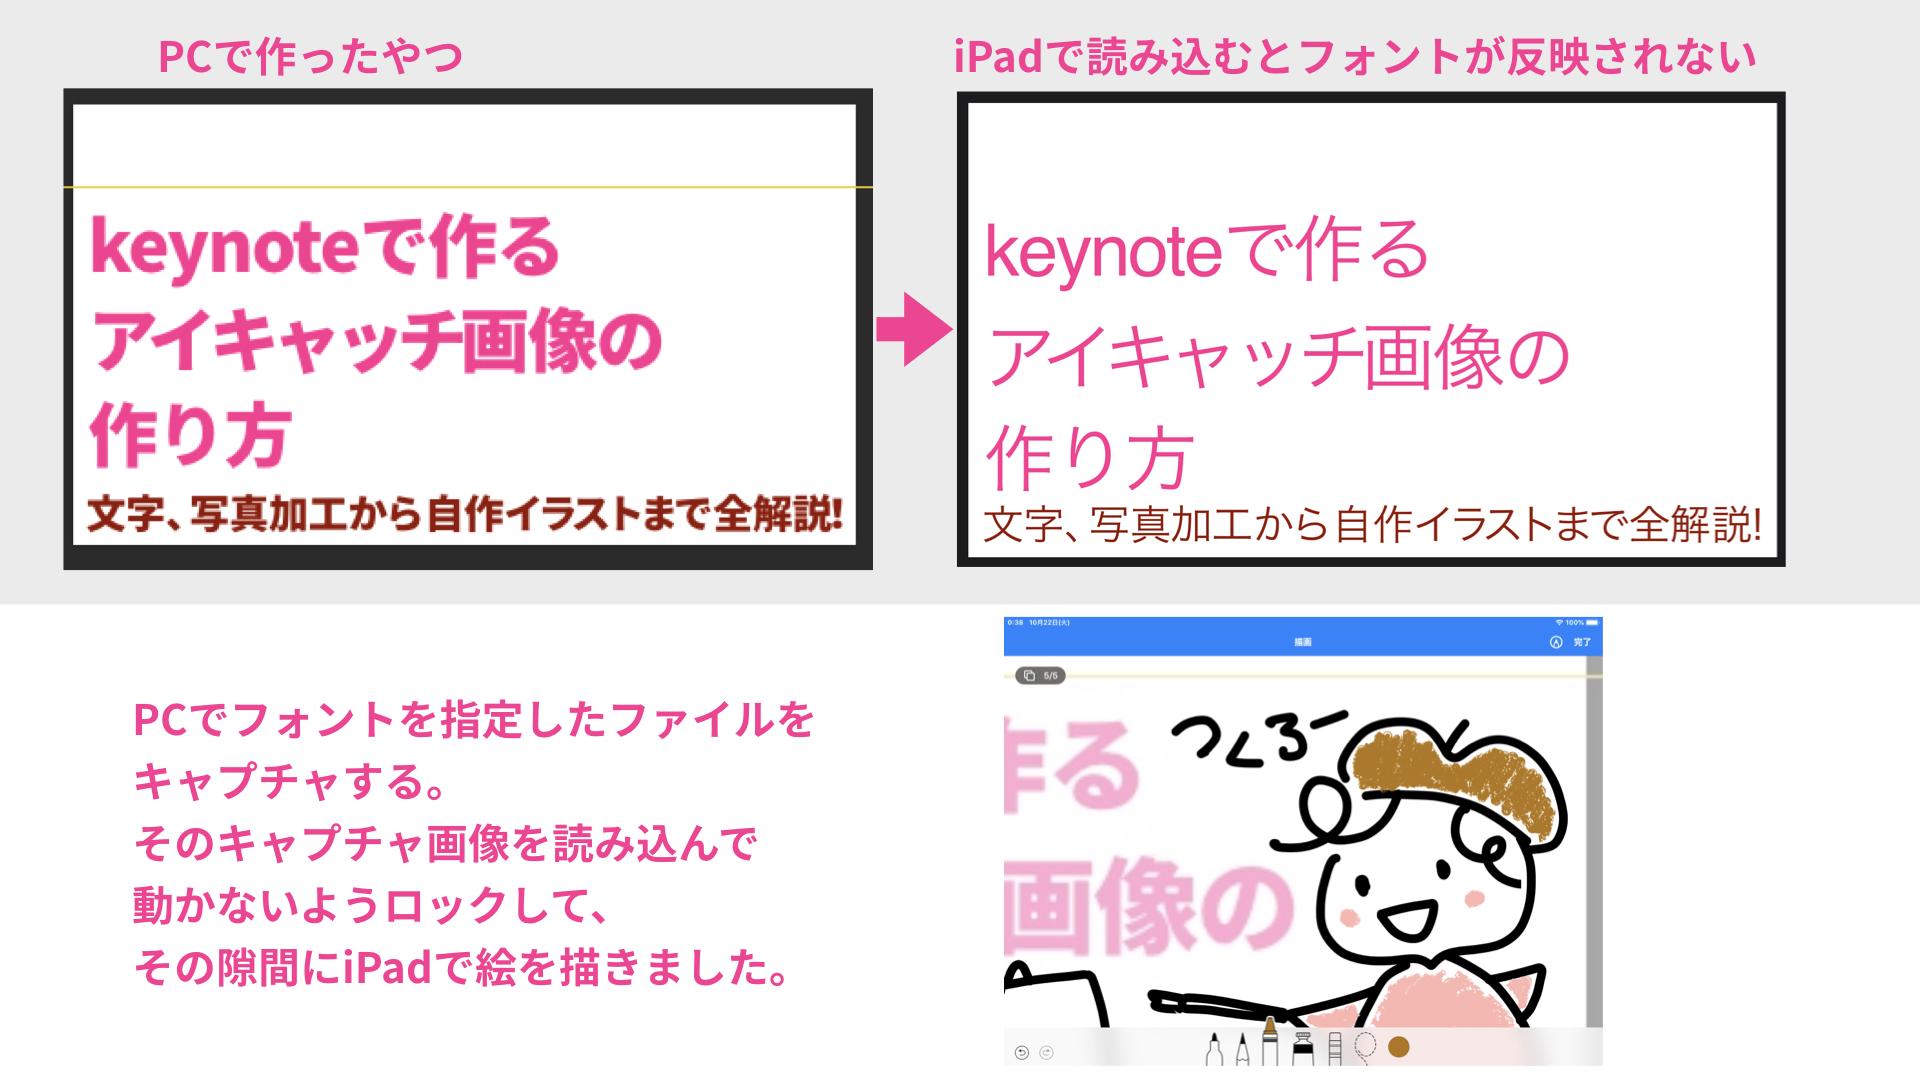 Keynoteで作るアイキャッチ画像の作り方〜文字、写真加工から自作イラストまで全解説!